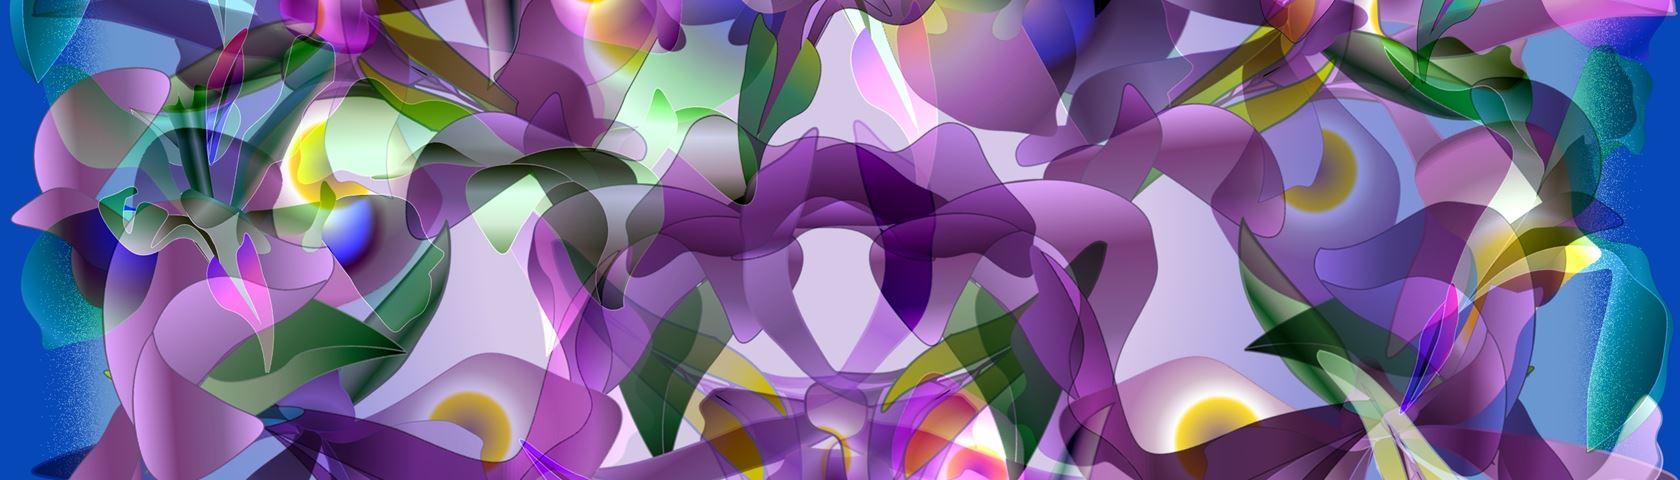 Wild Iris Collage